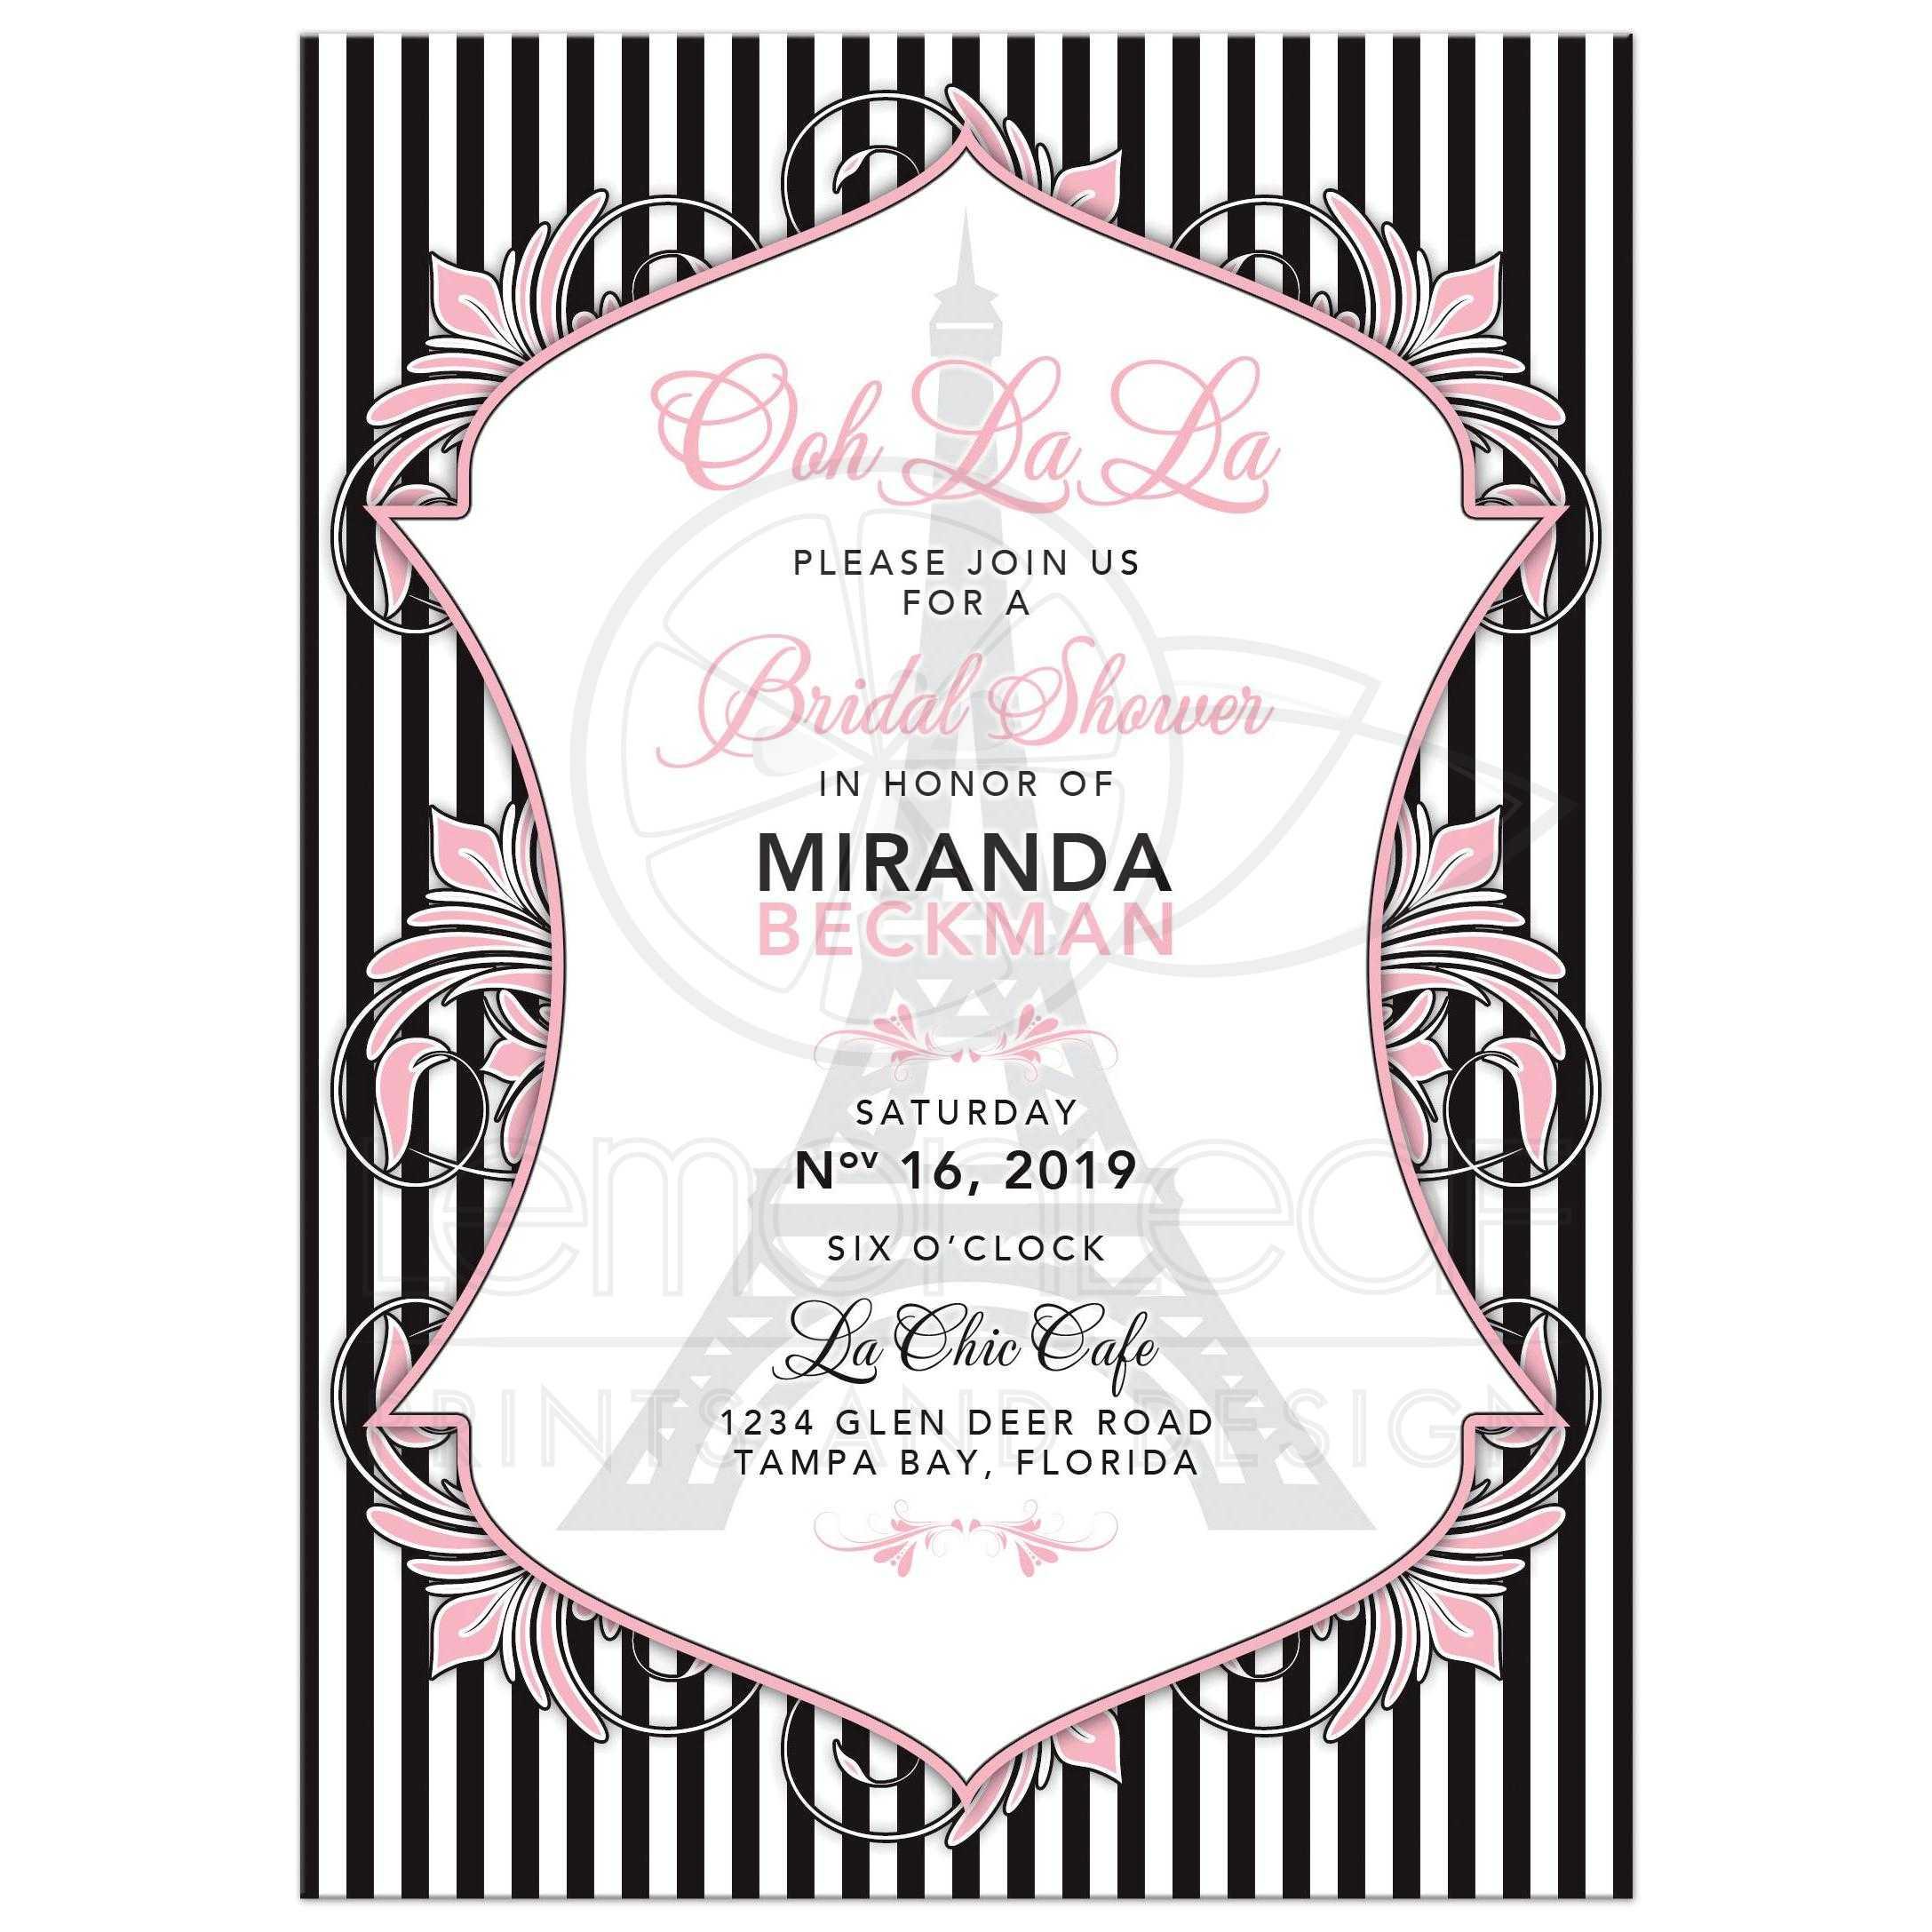 pink black white paris parisian eiffel tower bridal shower invitation with bold stripes and